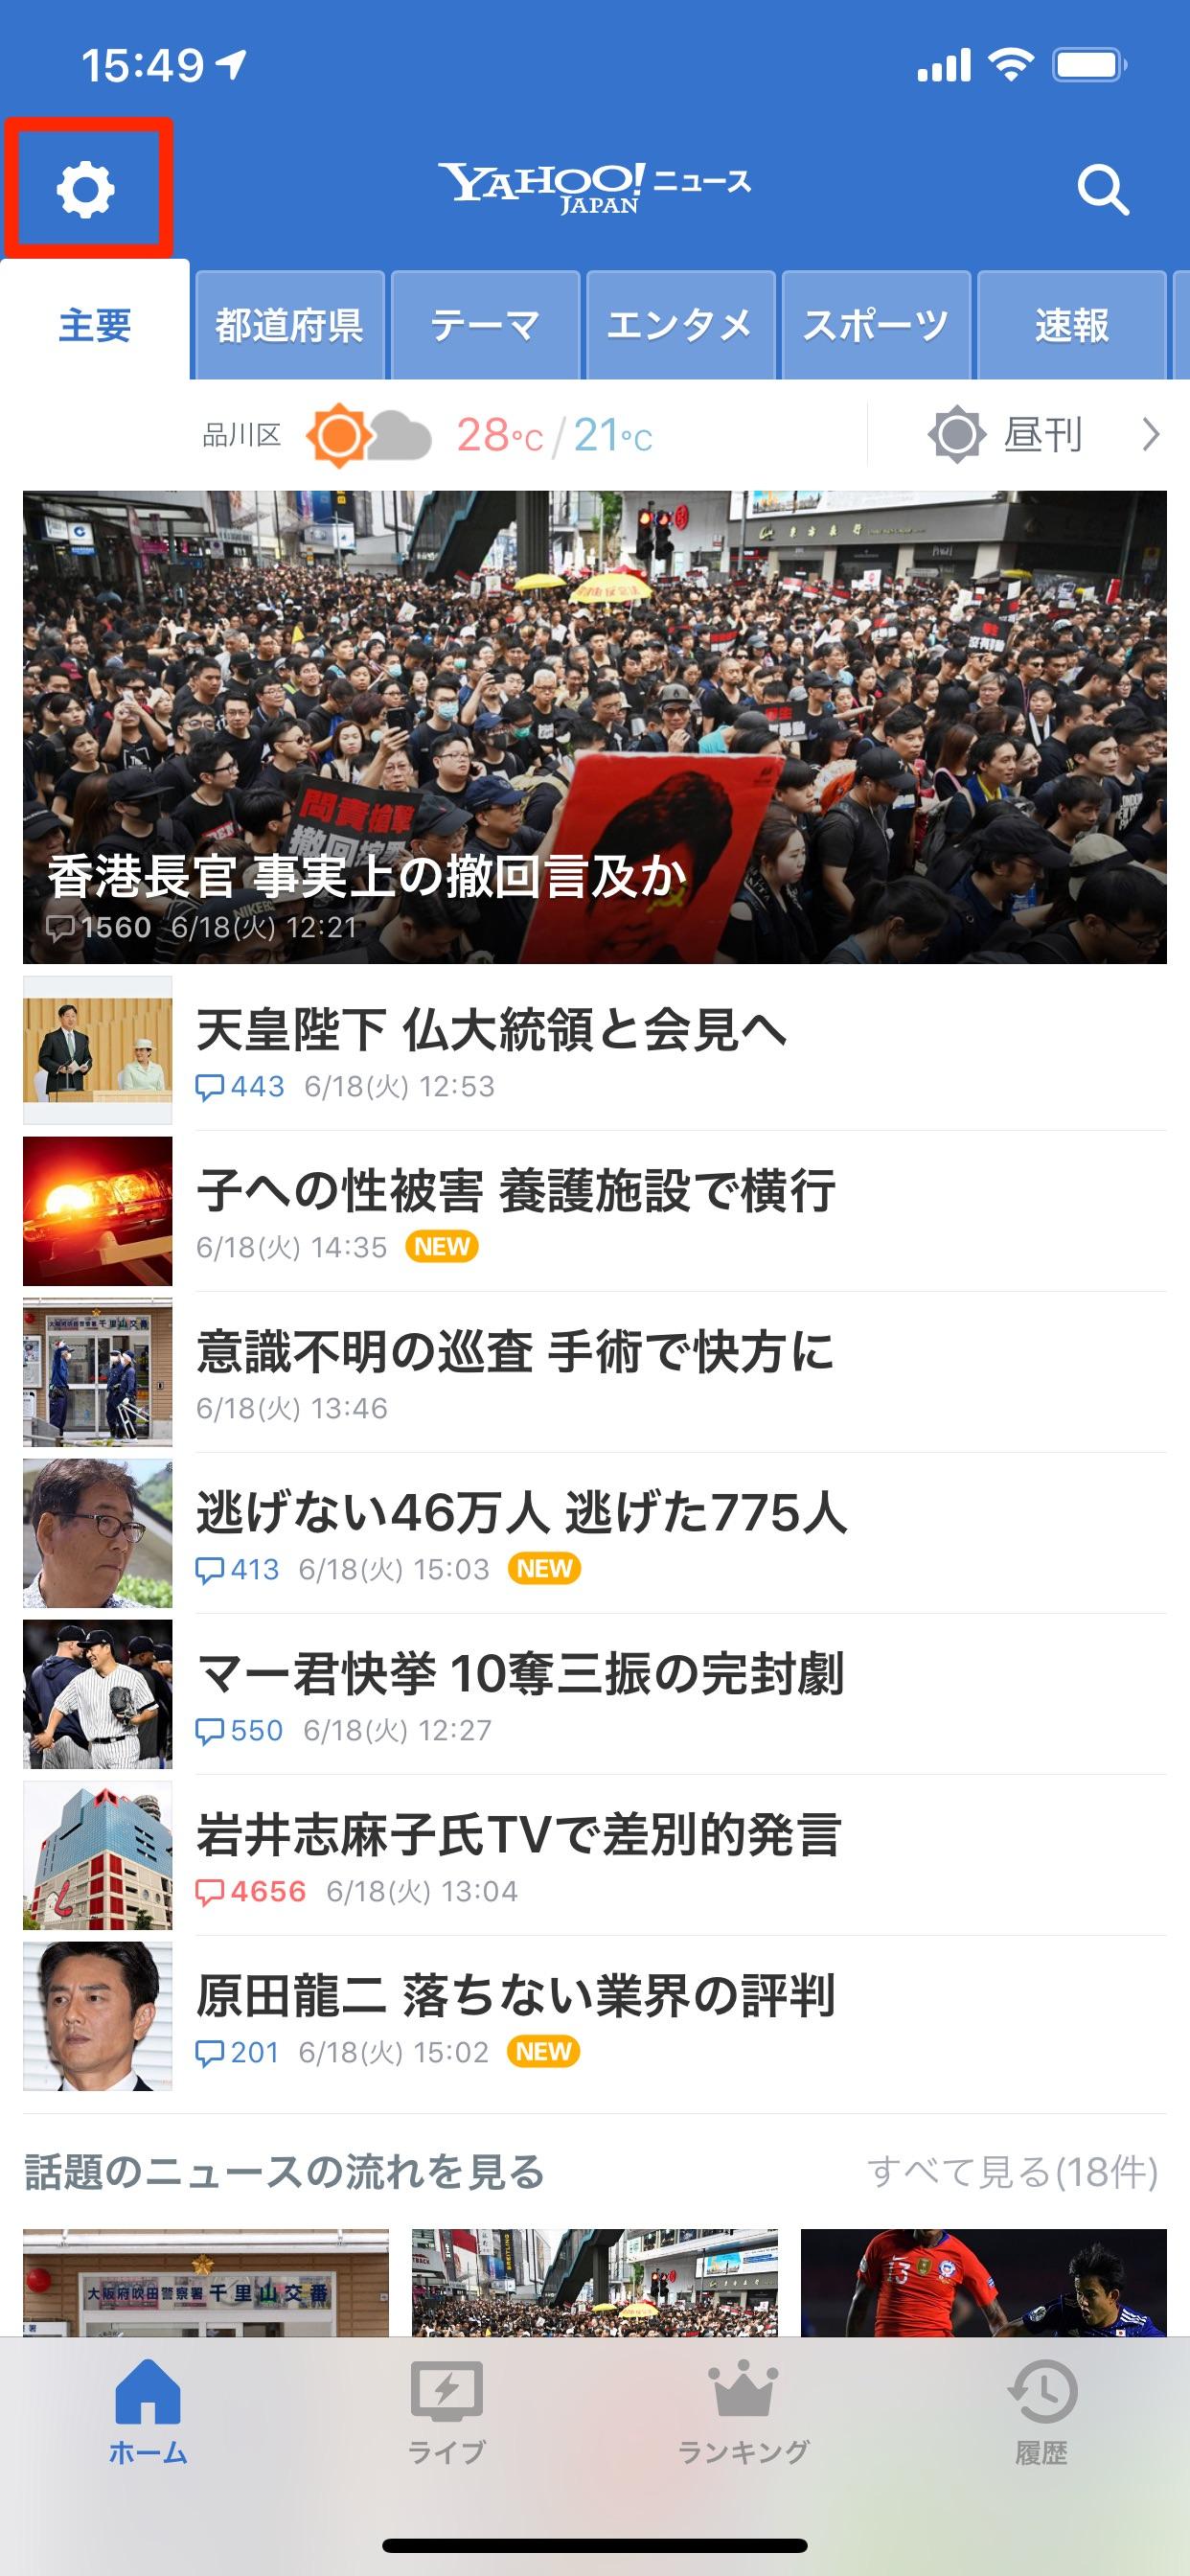 yahoo-score-newsapp-1